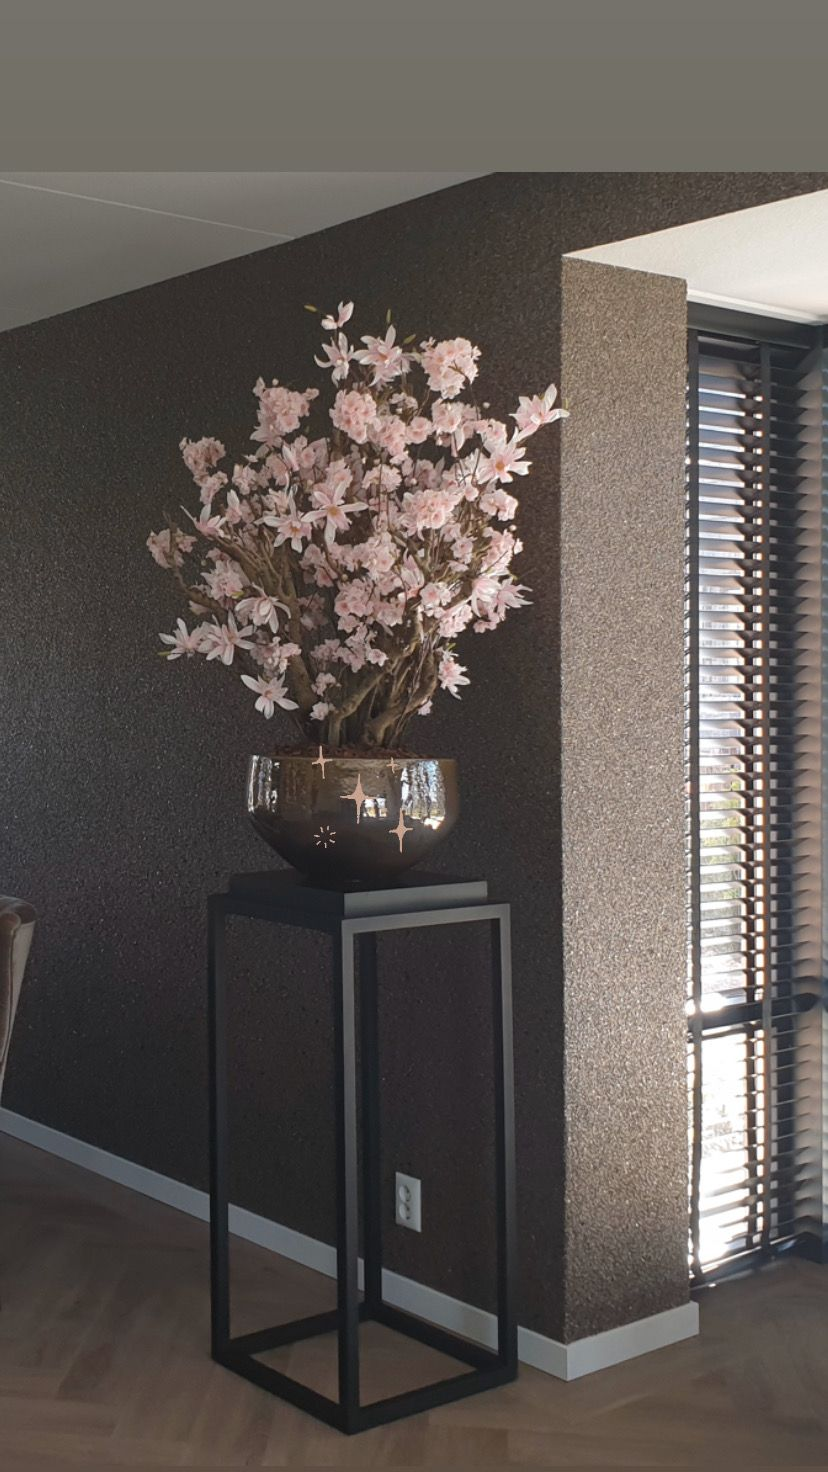 Luxury Flowers Huis Interieur Woonkamer Decoratie Binnenhuisarchitect